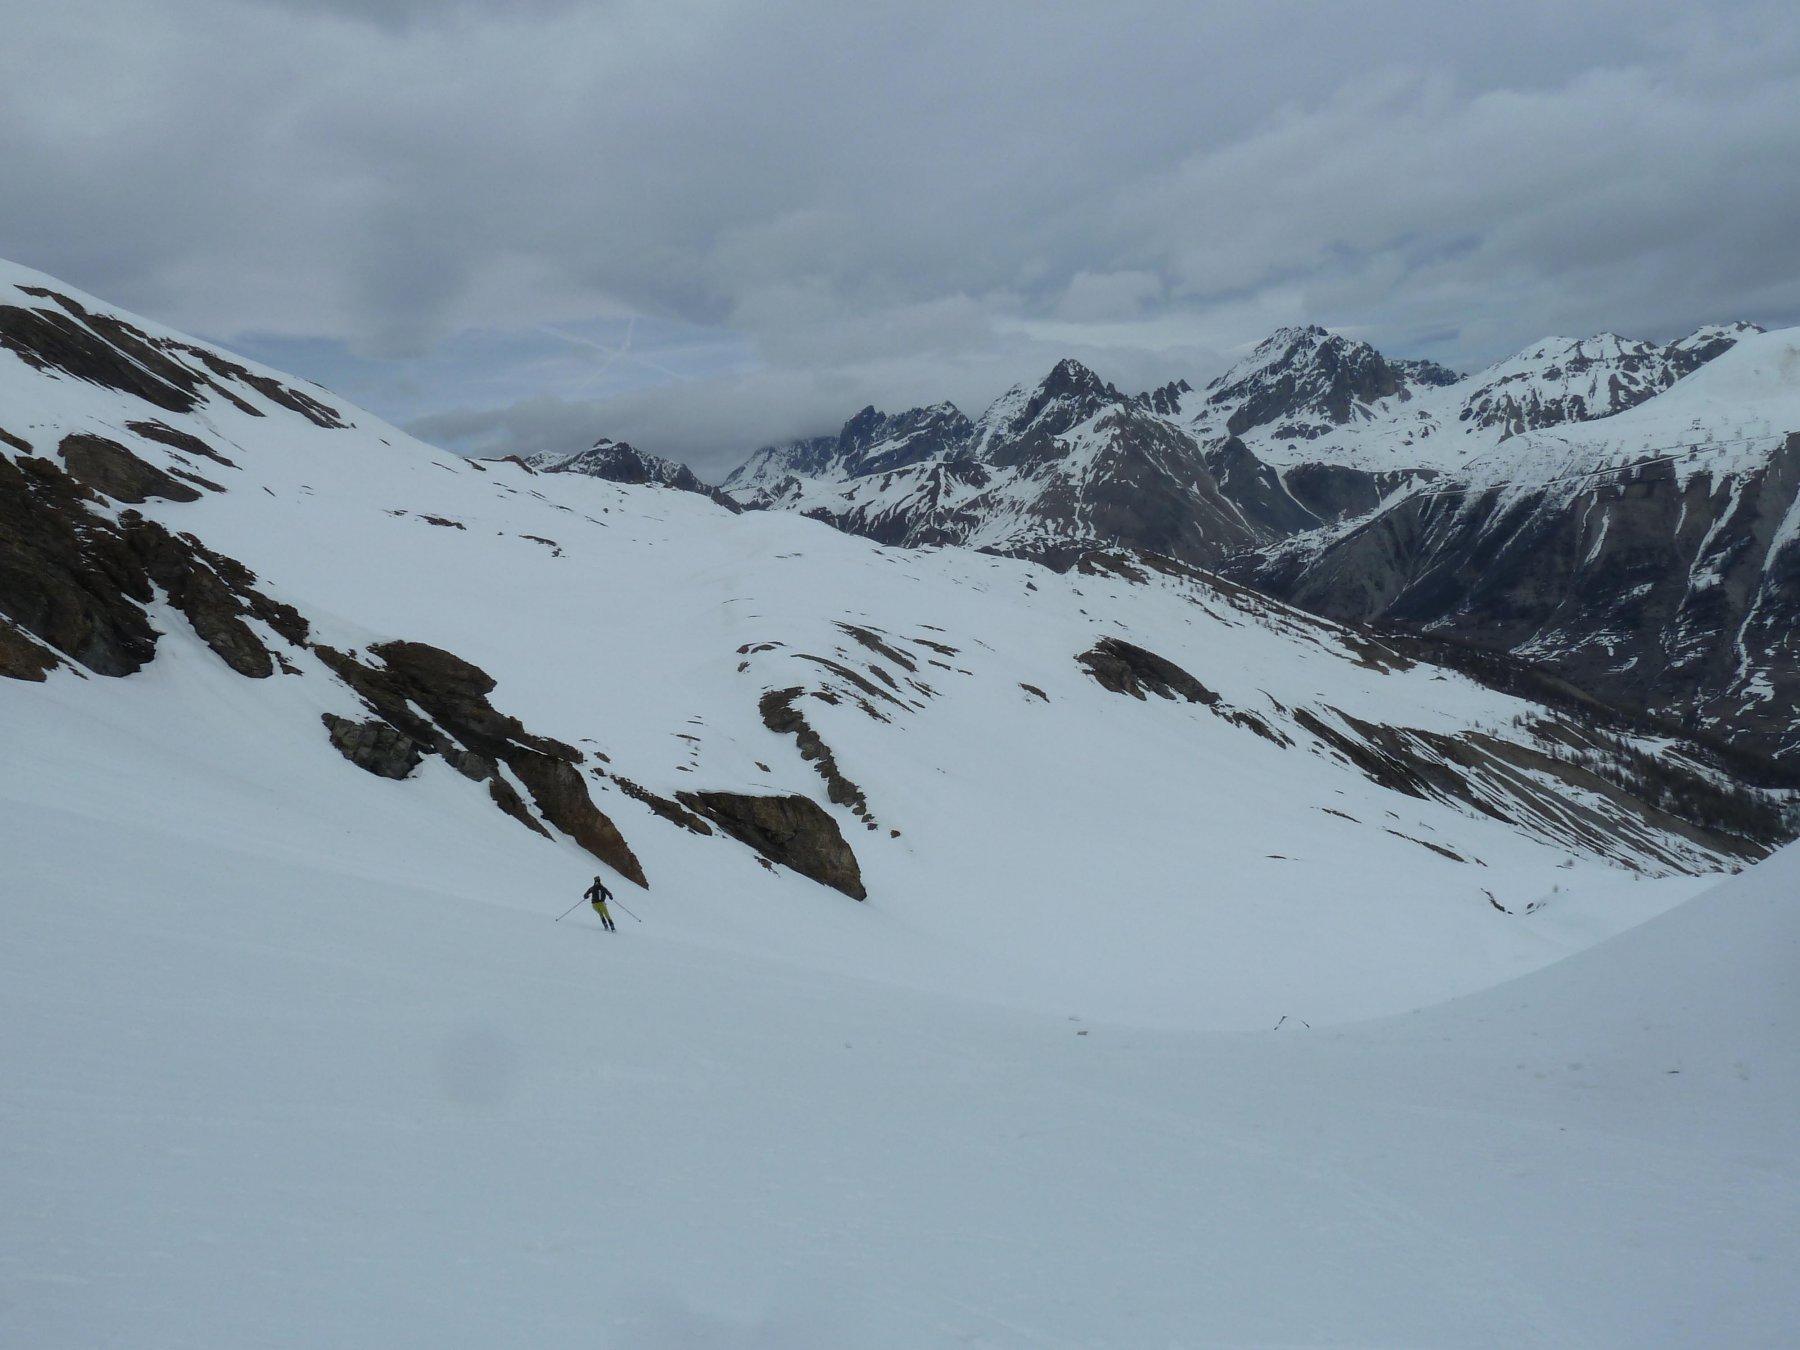 poca neve sui versanti a sud sopra Larche